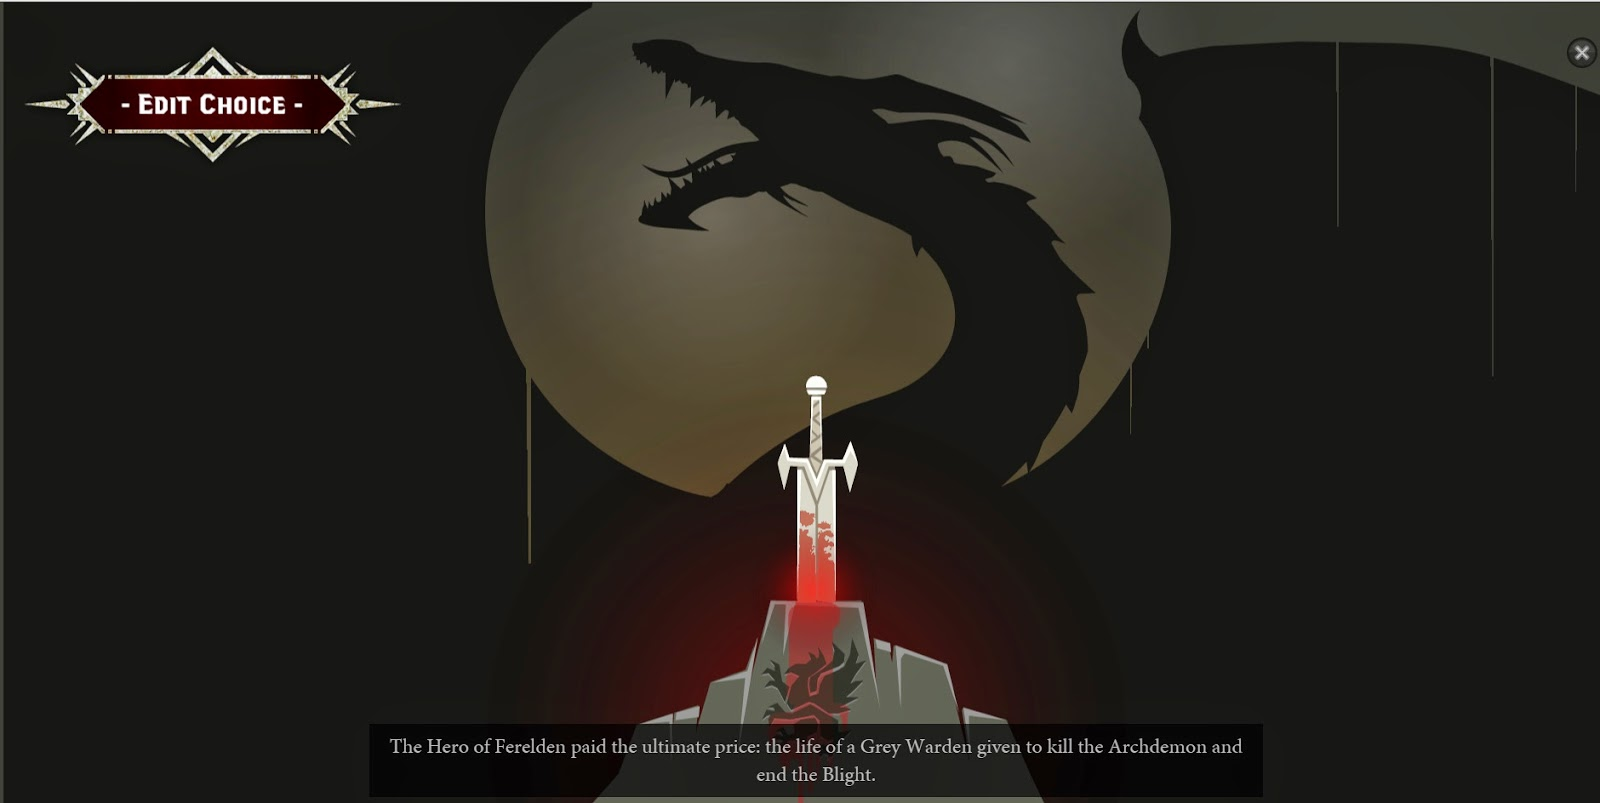 dragon age keep narracion